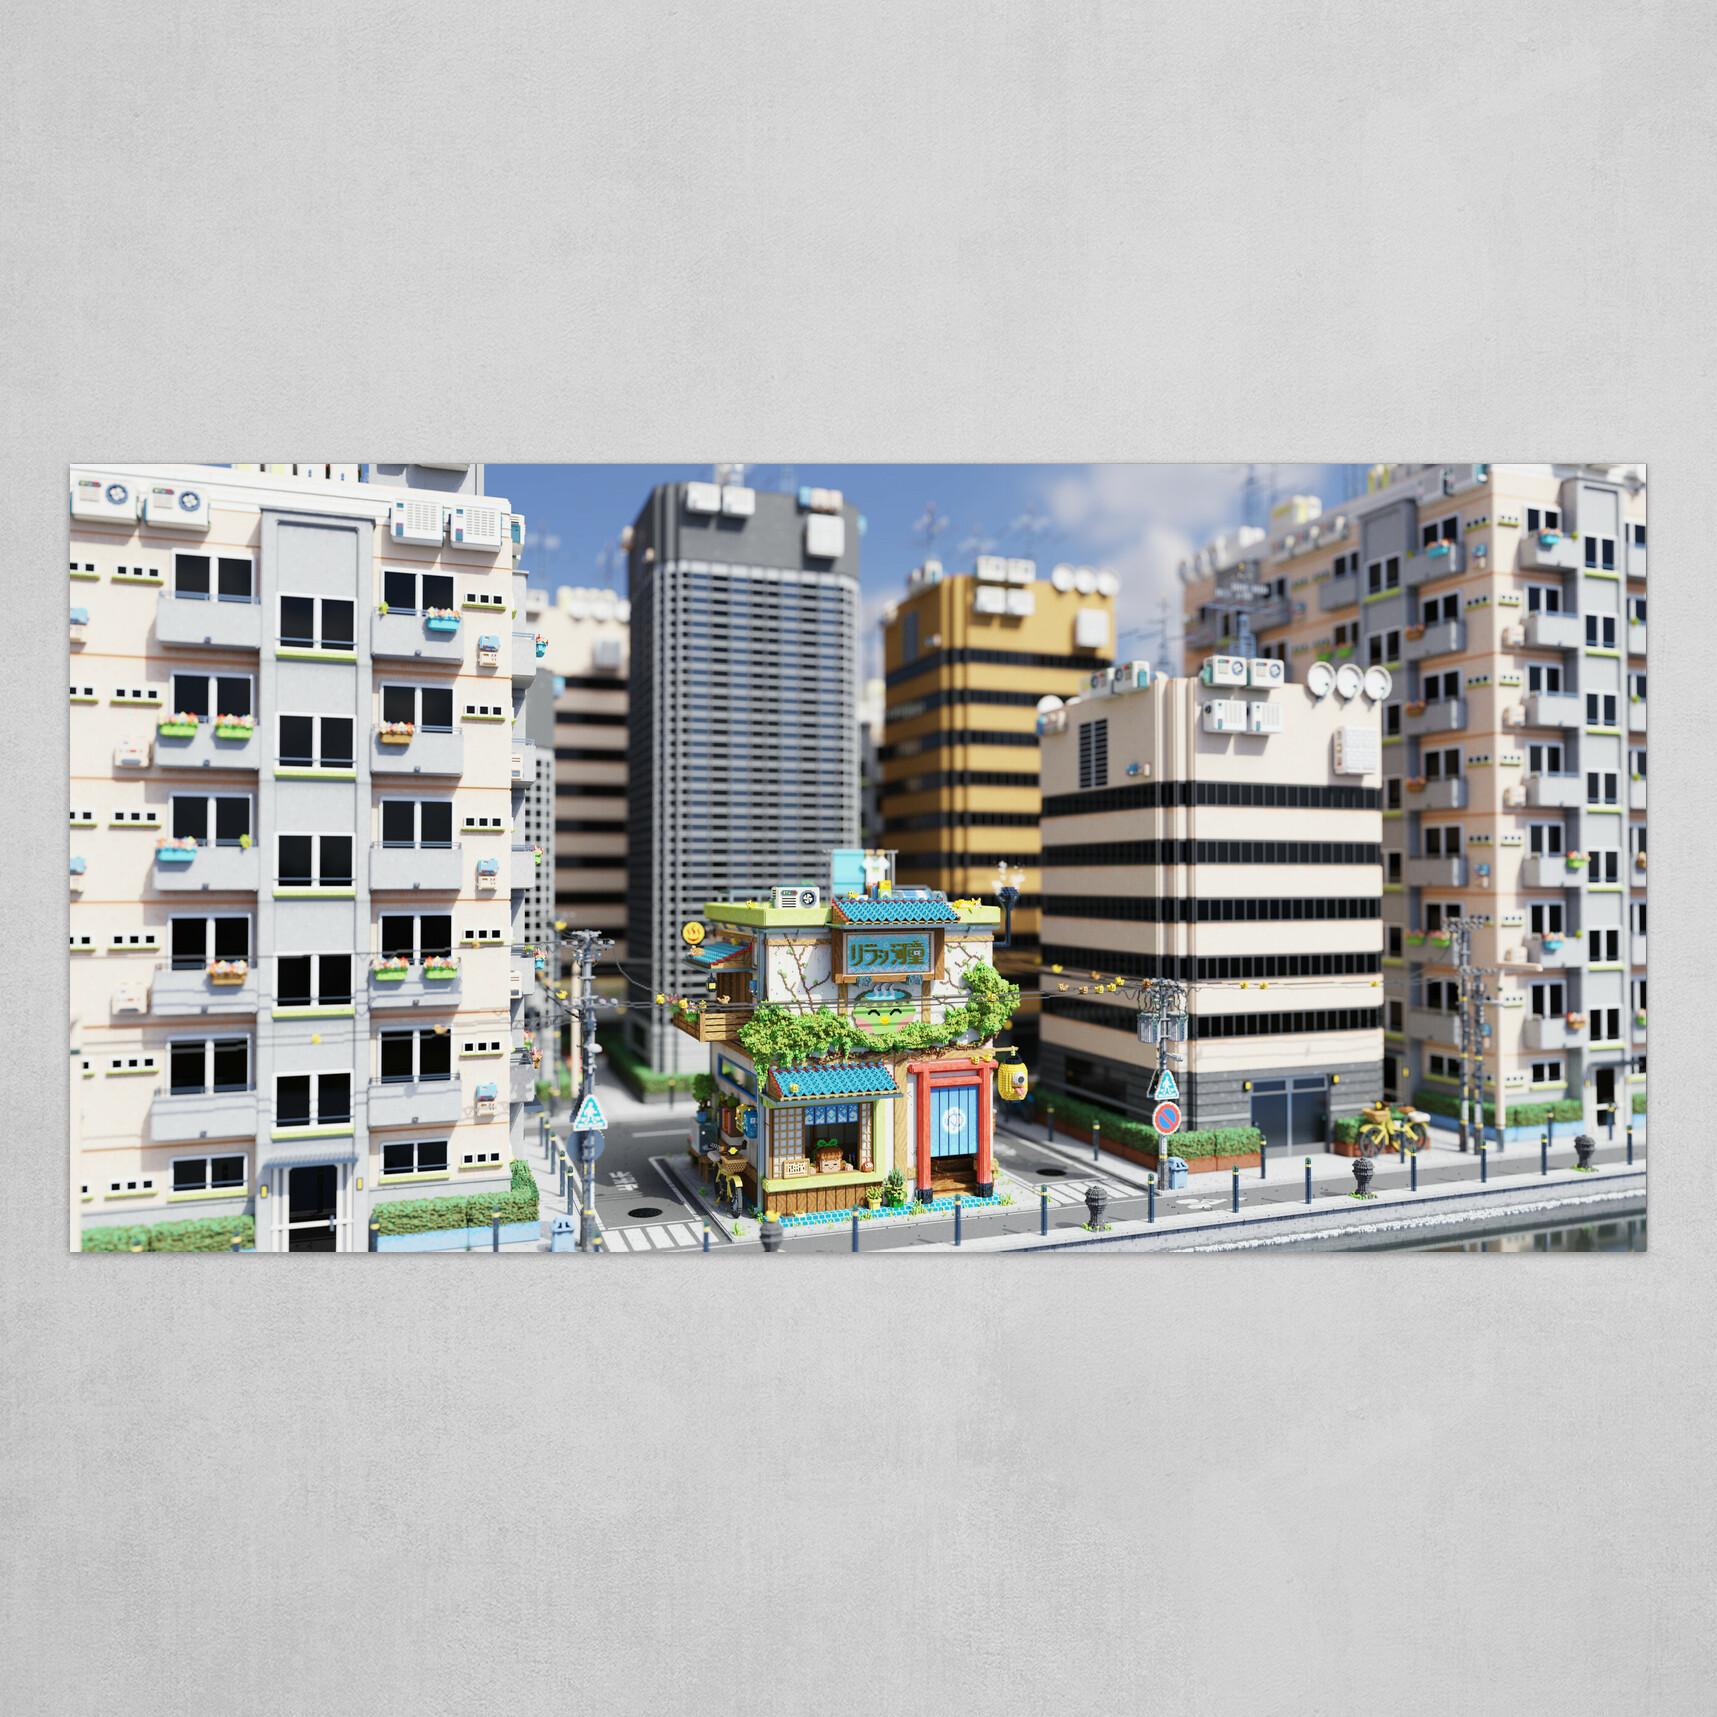 Voxel - Onsen Street - Day 01